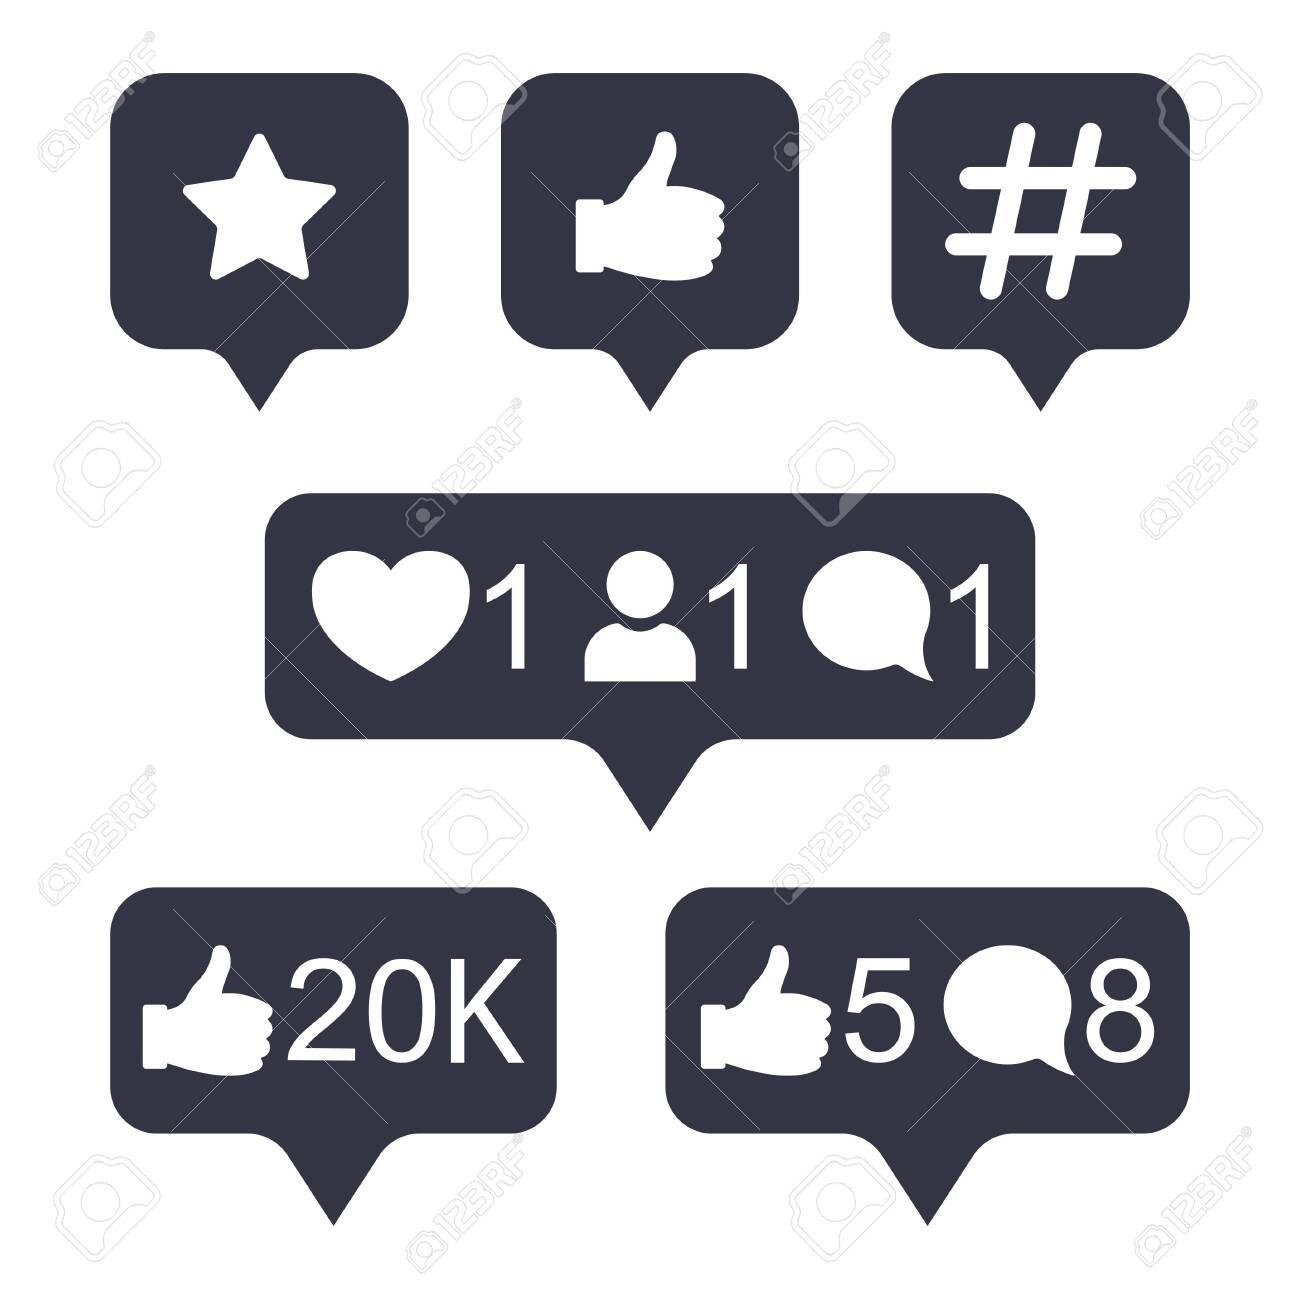 Social media modern button in golden gradient color. Like, follower, comment button, icon, symbol, ui, app, web. Vector illustration. - 147130327